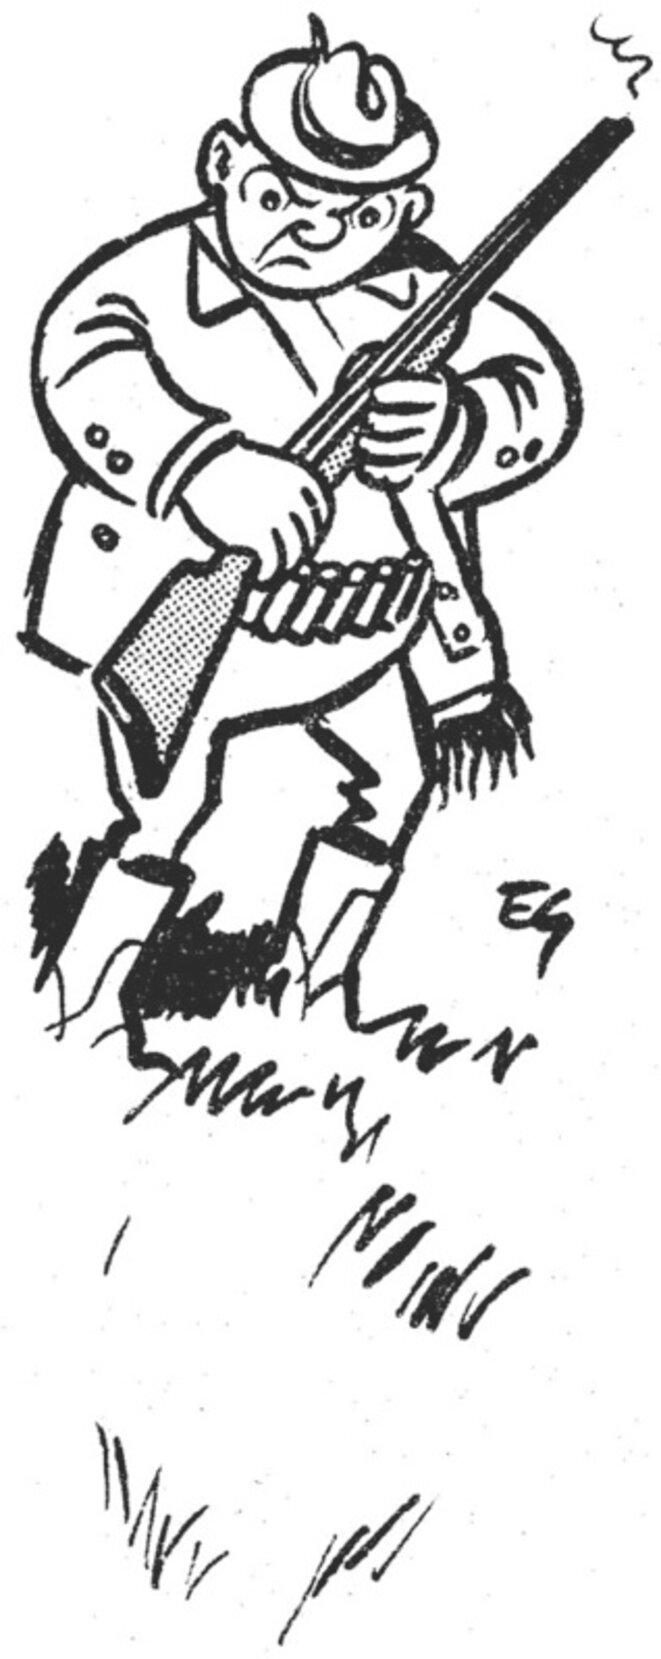 Chasseur dessin 1 © Etienne Mahler